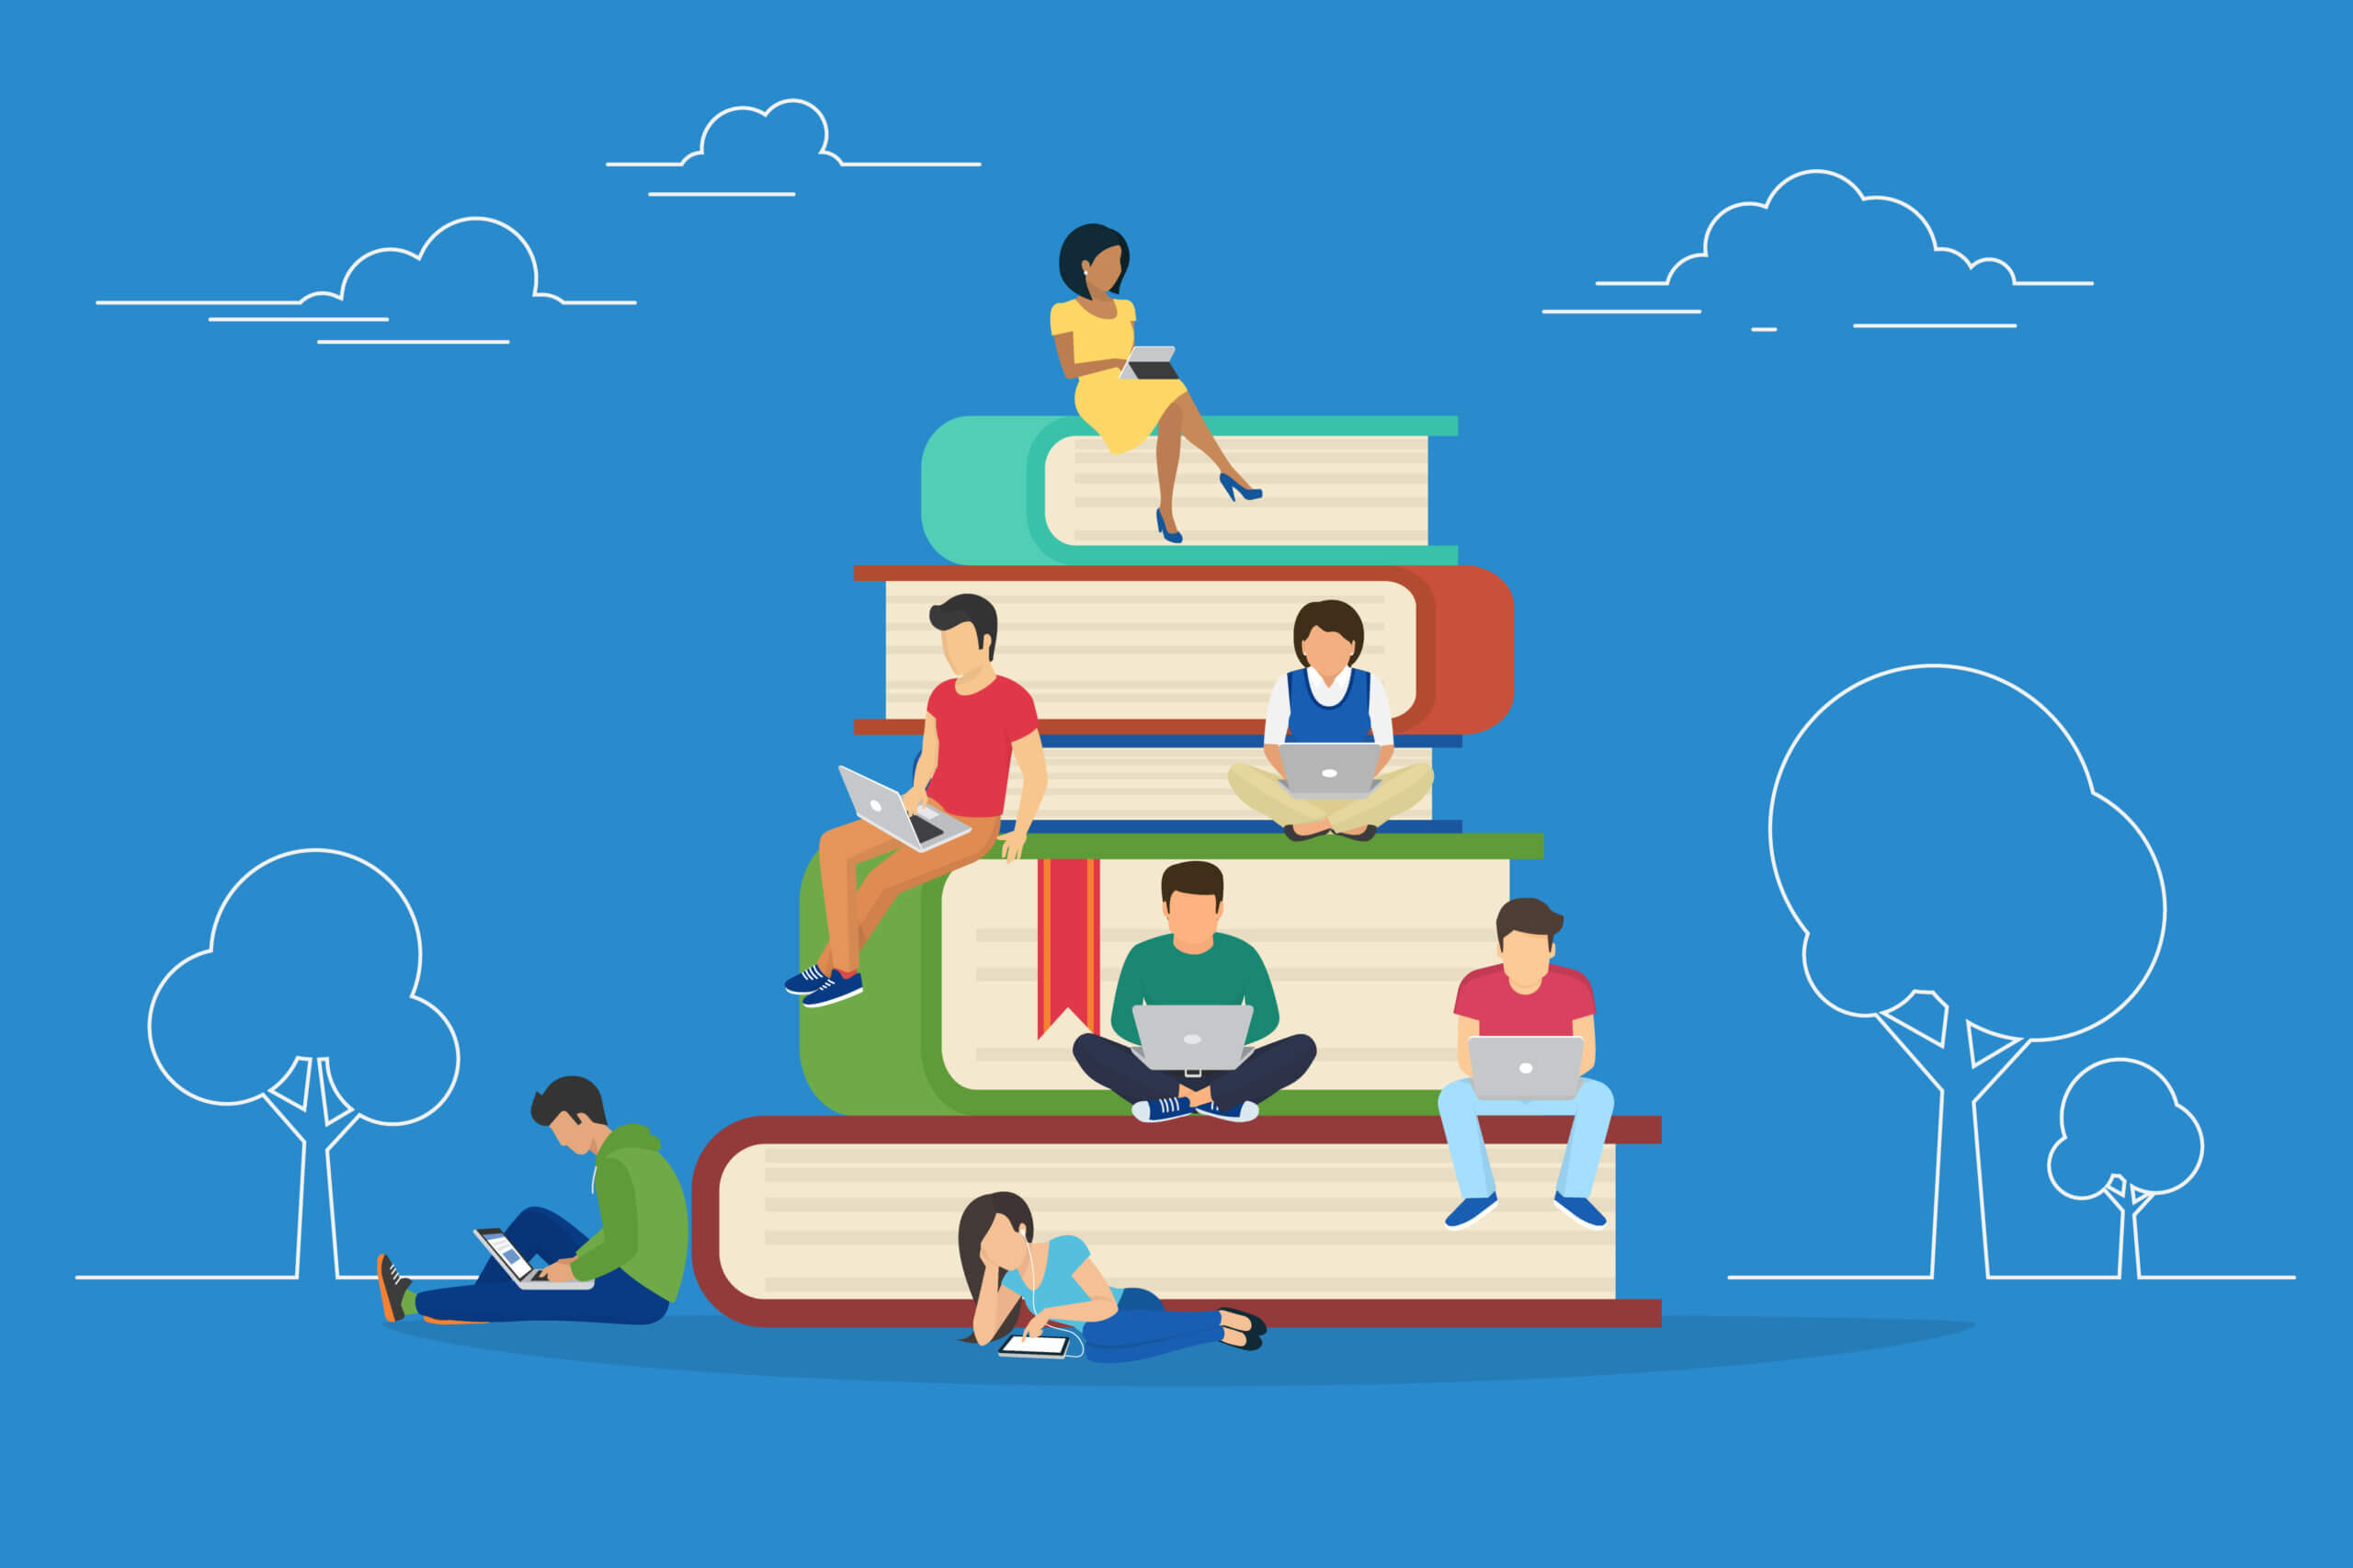 Test de Kolb para determinar estilos de aprendizaje